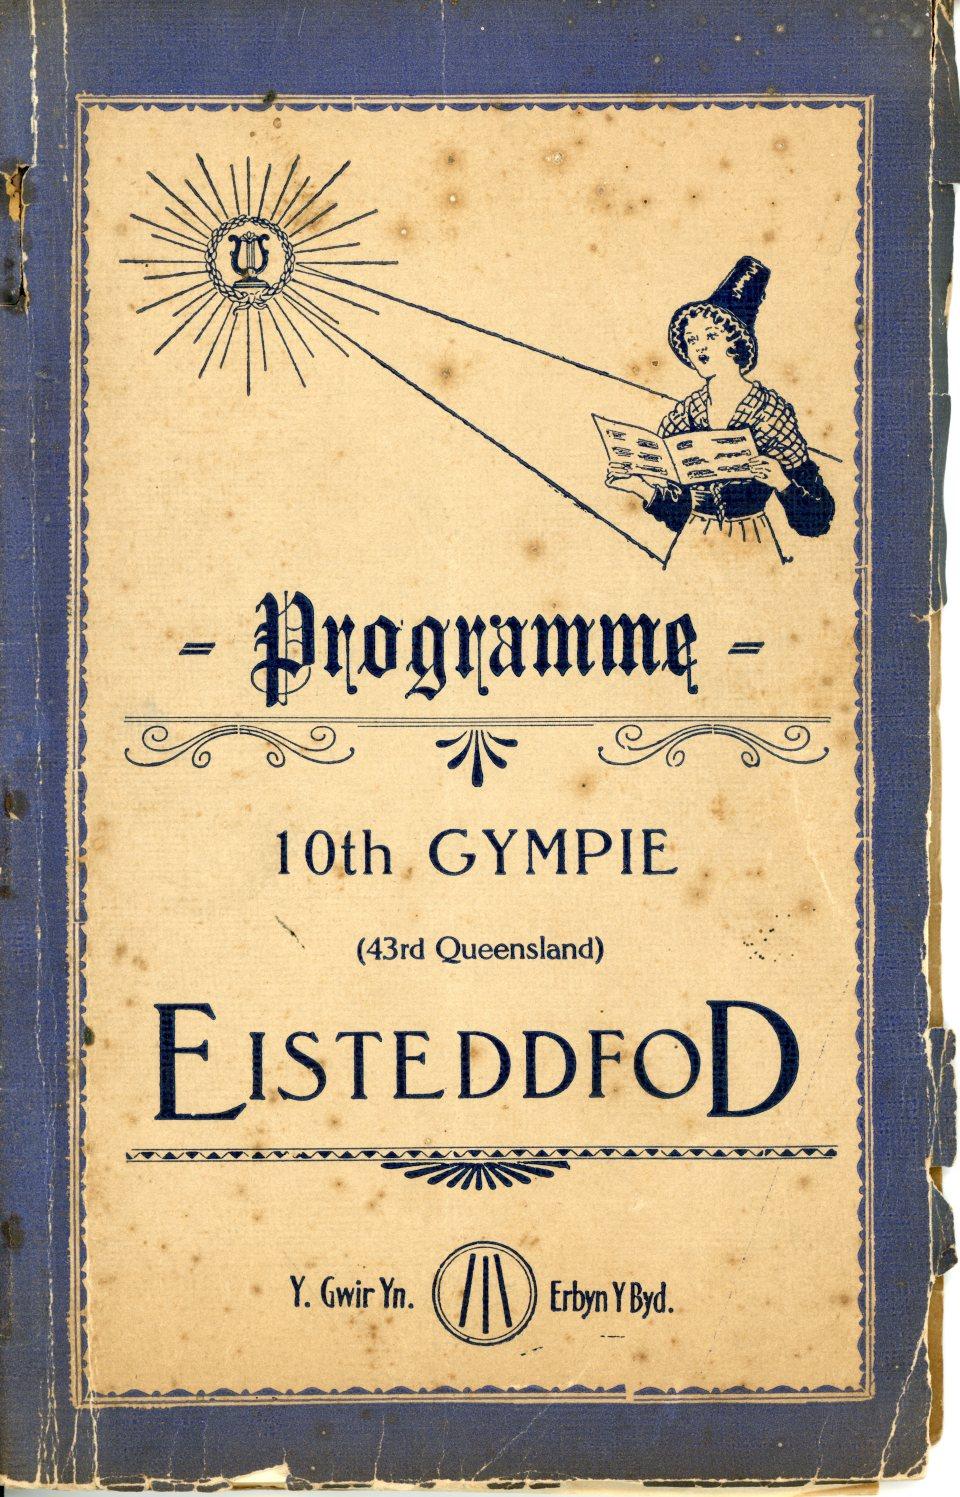 10th Gympie Eisteddfod Programme